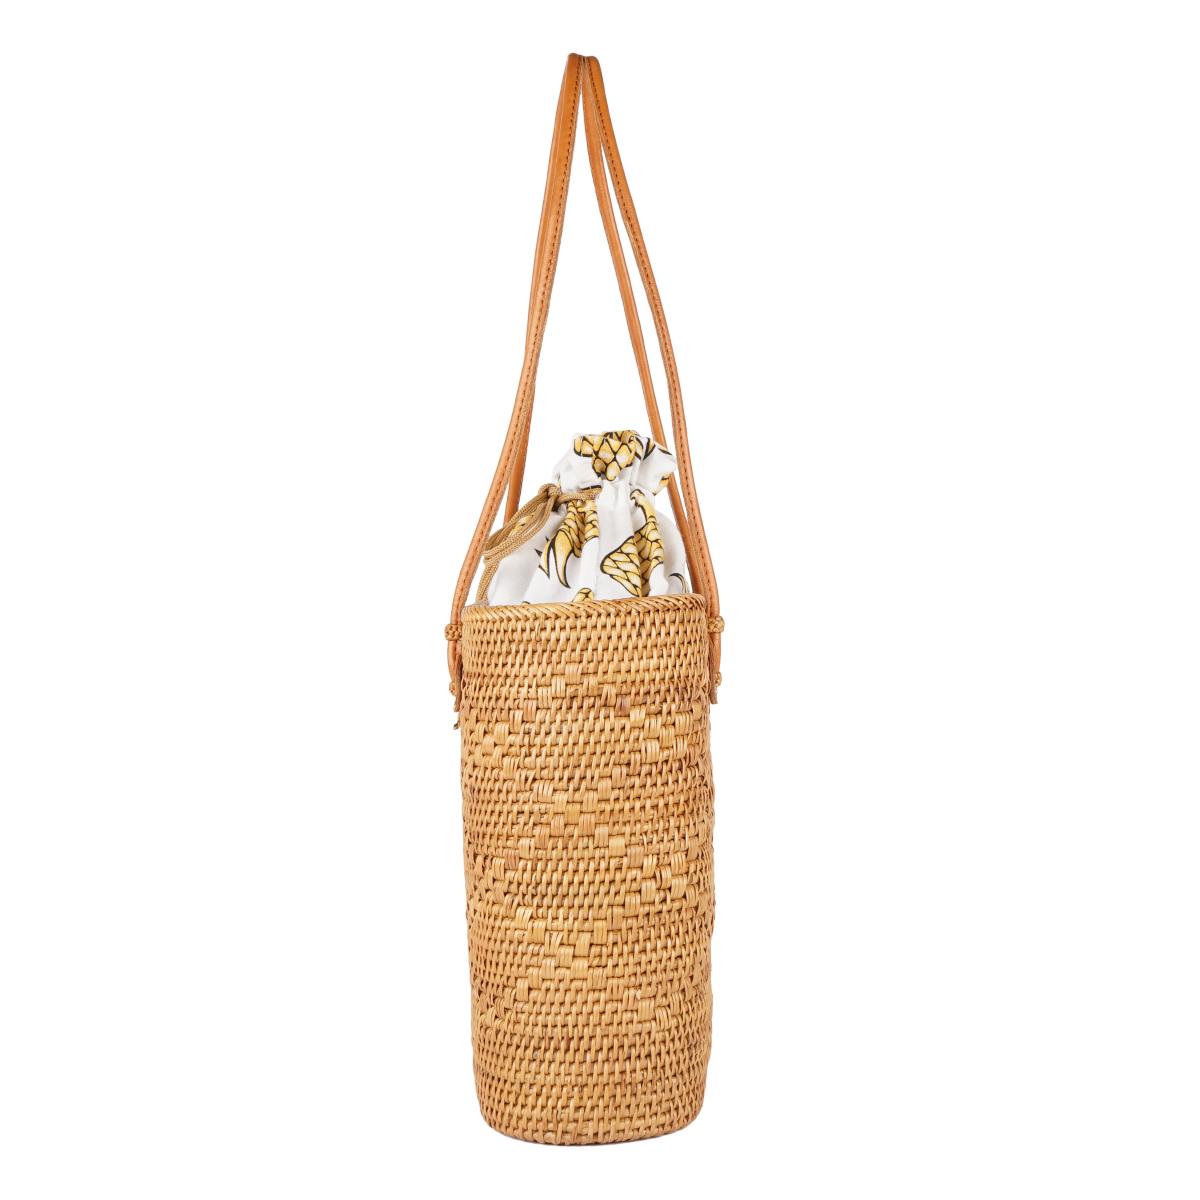 【ATA BAG】La Cute オリジナルテキスタイル かごトートバッグL (パイナップル) LAAT004